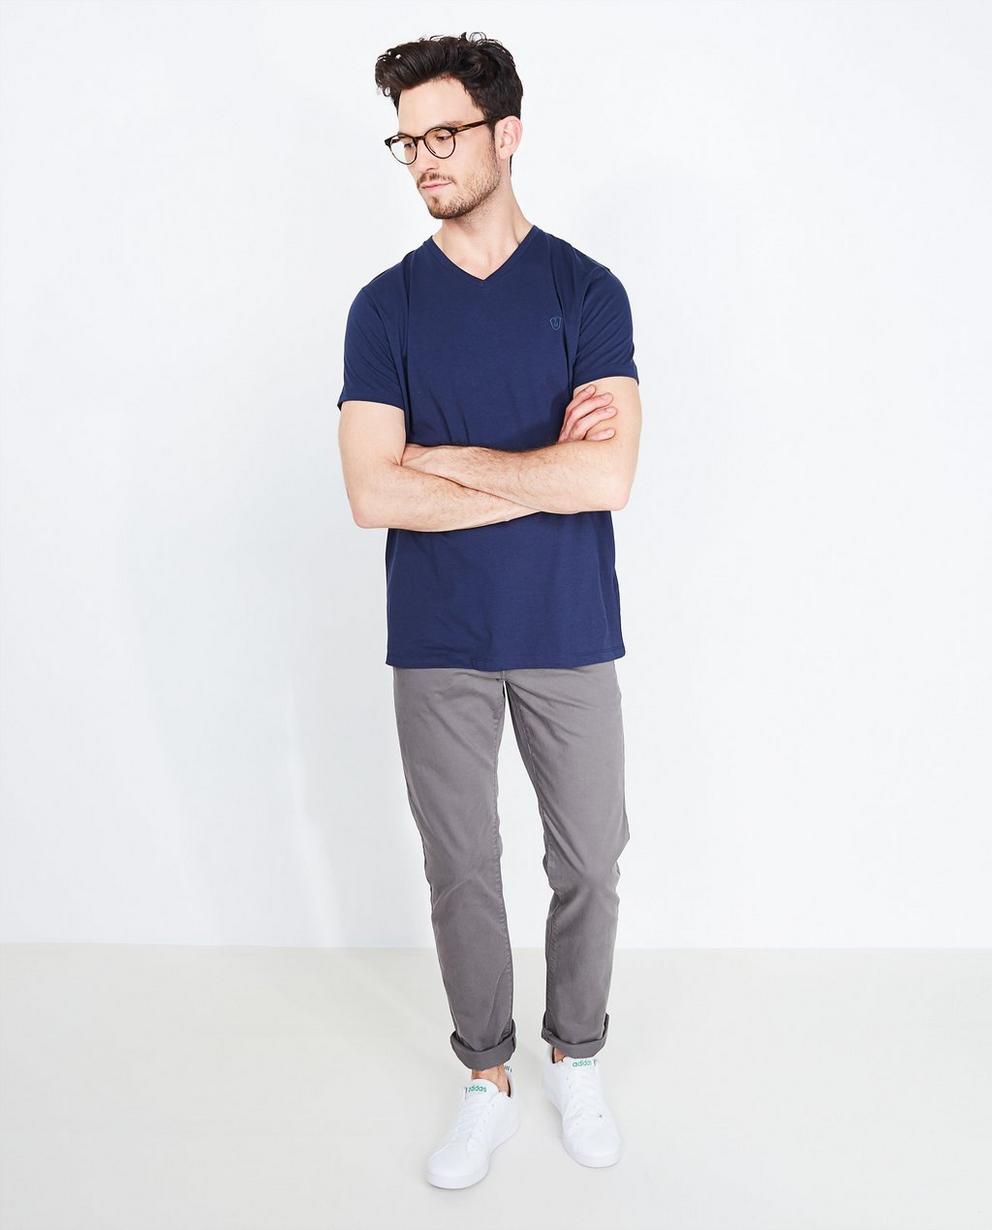 T-shirt avec encolure en V - bleu marine, en coton bio - Tim Moore